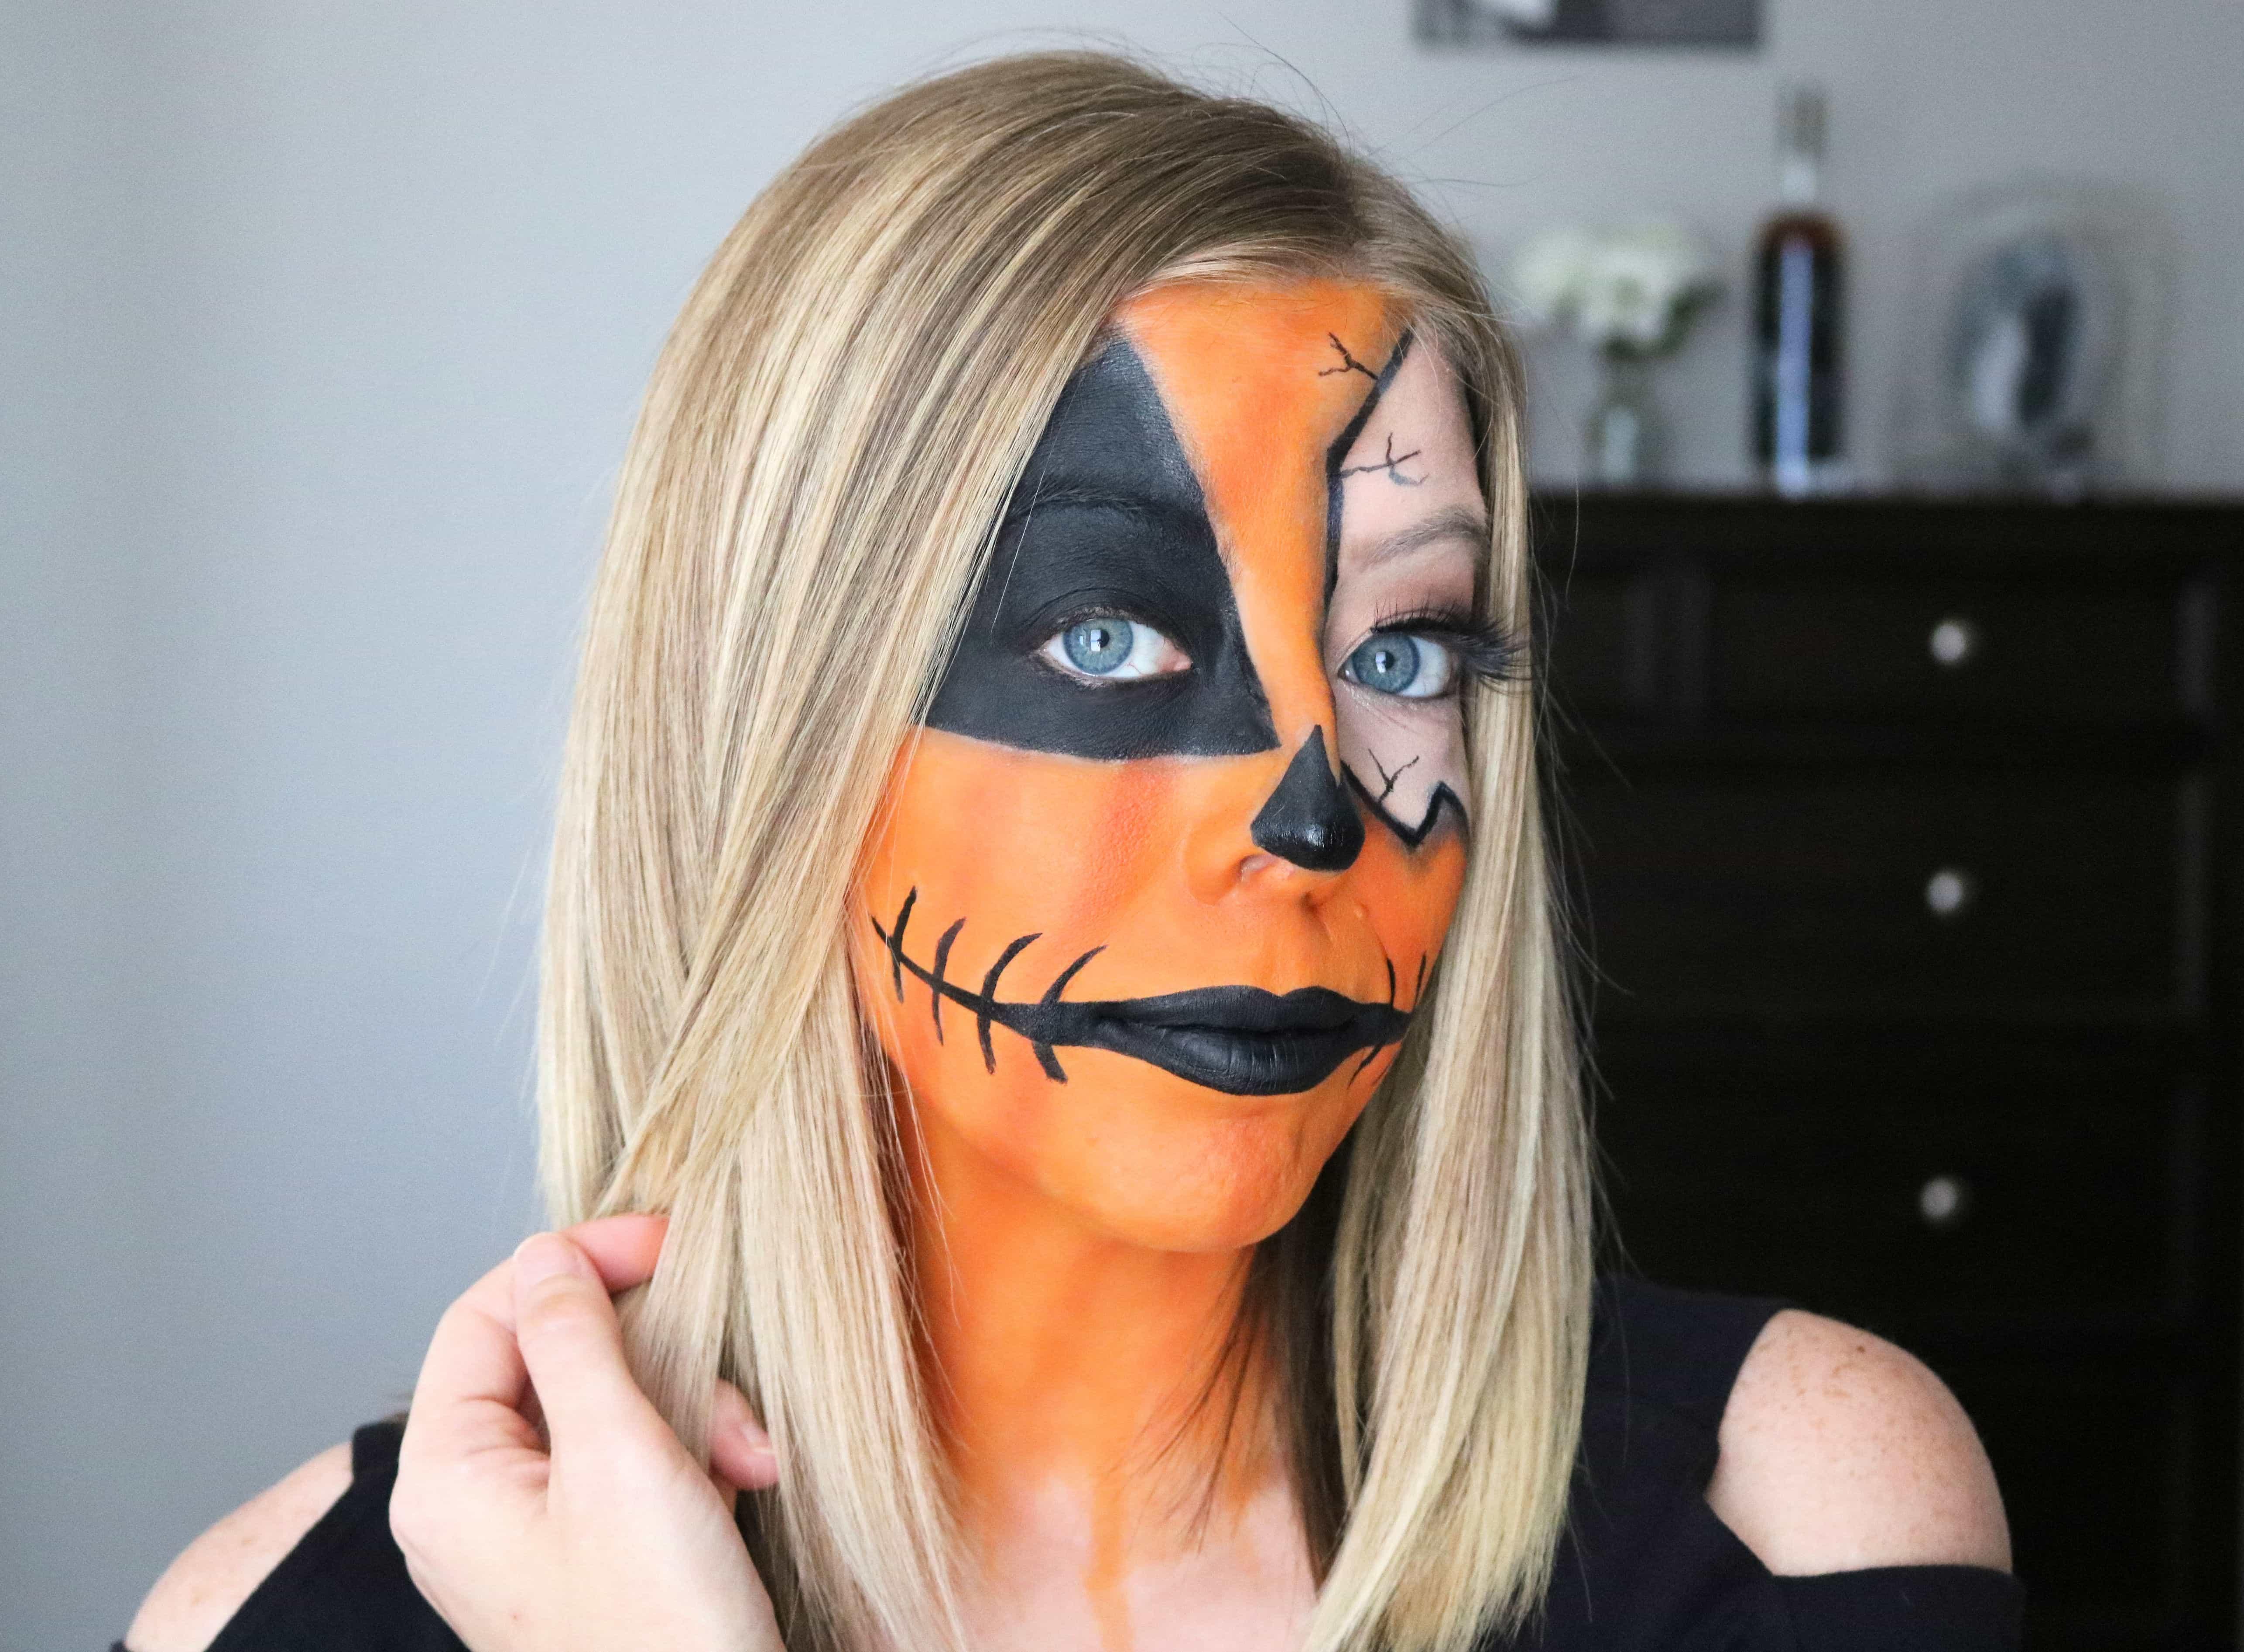 Love jack o' lantern pumpkins? Then create a spooky and fun halloween makeup look this year with my easy cracked pumpkin makeup tutorial! #pumpkinmakeup #halloweenmakeup #halloweenmakeuptutorial #halloween #jackolantern